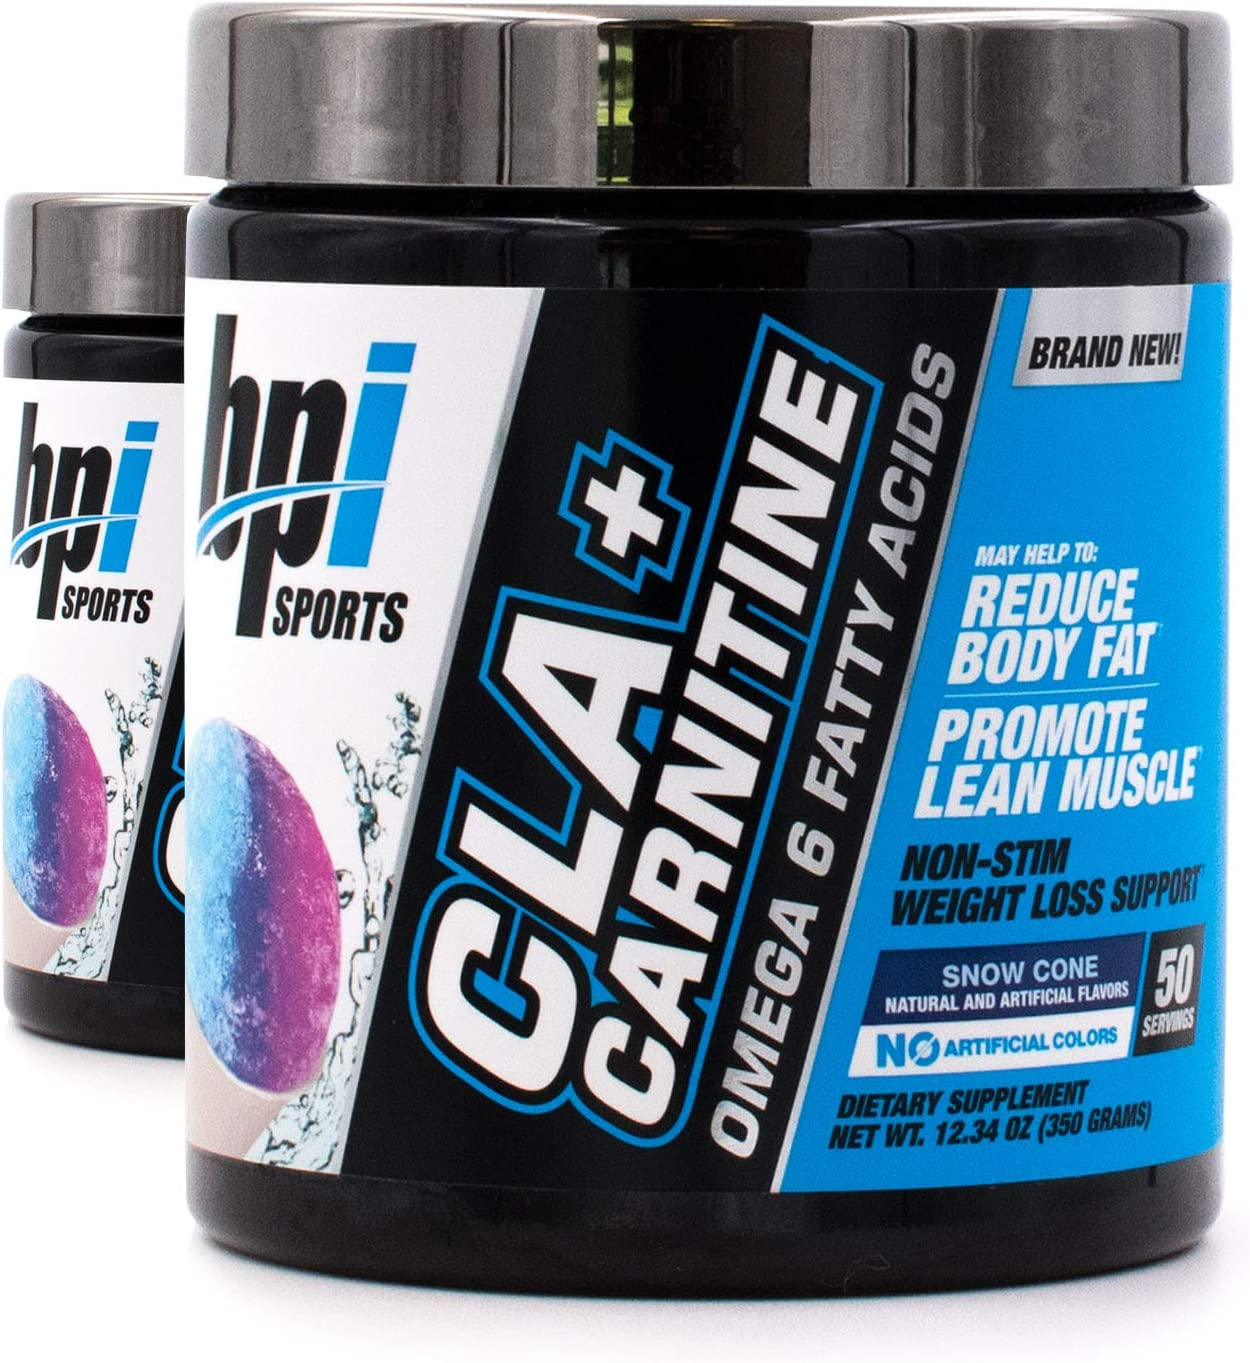 BPI Sports Cla + Carnitine Ranking TOP4 Loss Super-cheap Supplement Weight Non-Stimulant